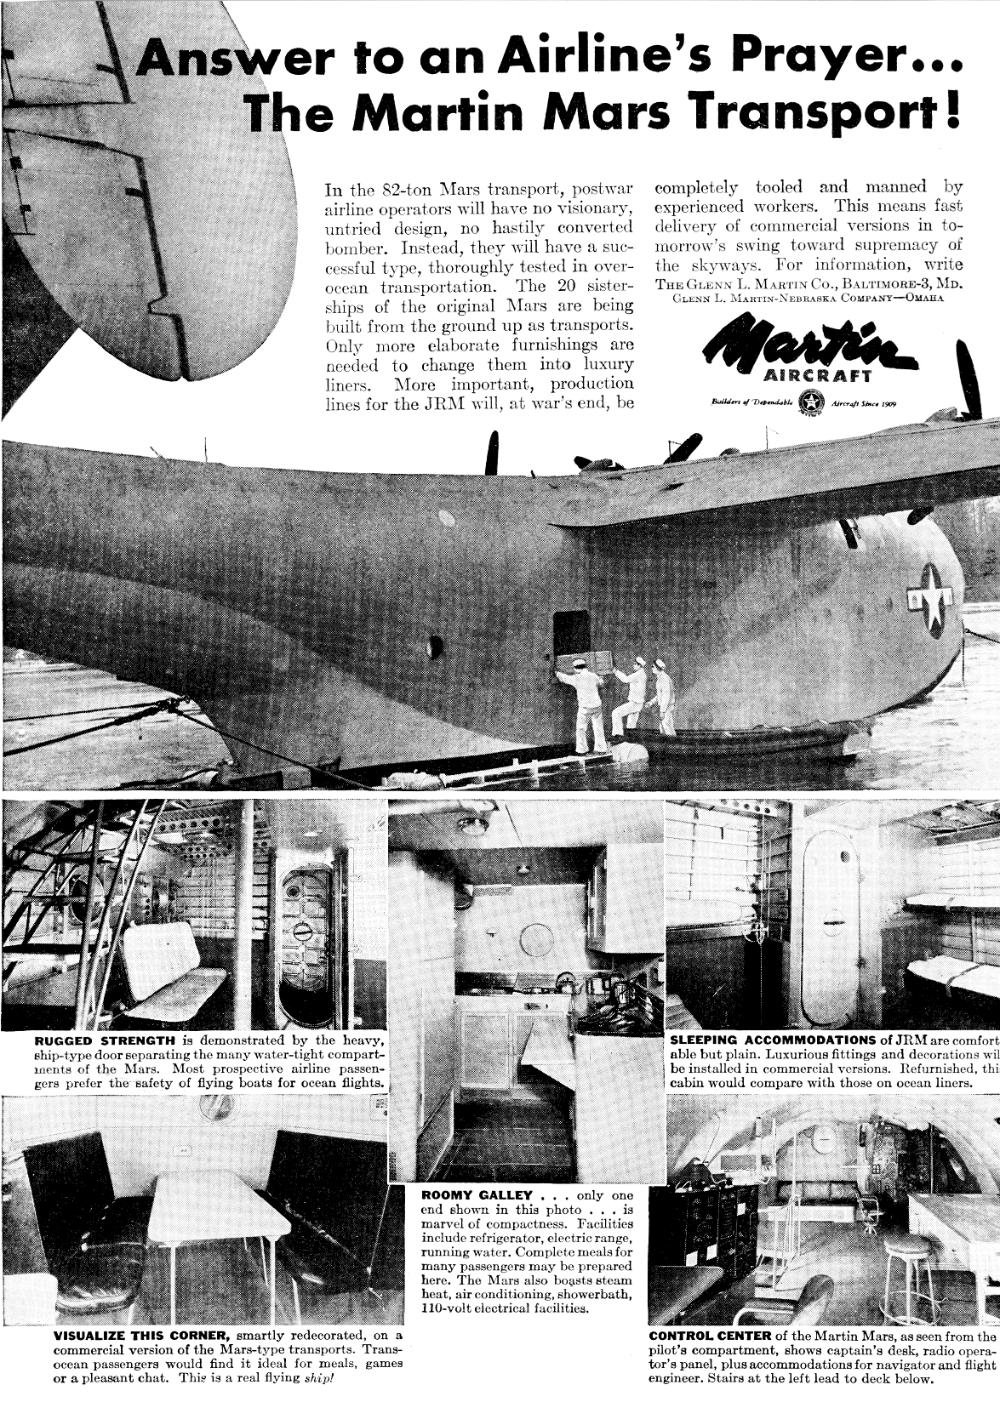 Litot Mars Index Cargo Transport Flying Boat Planner Writing